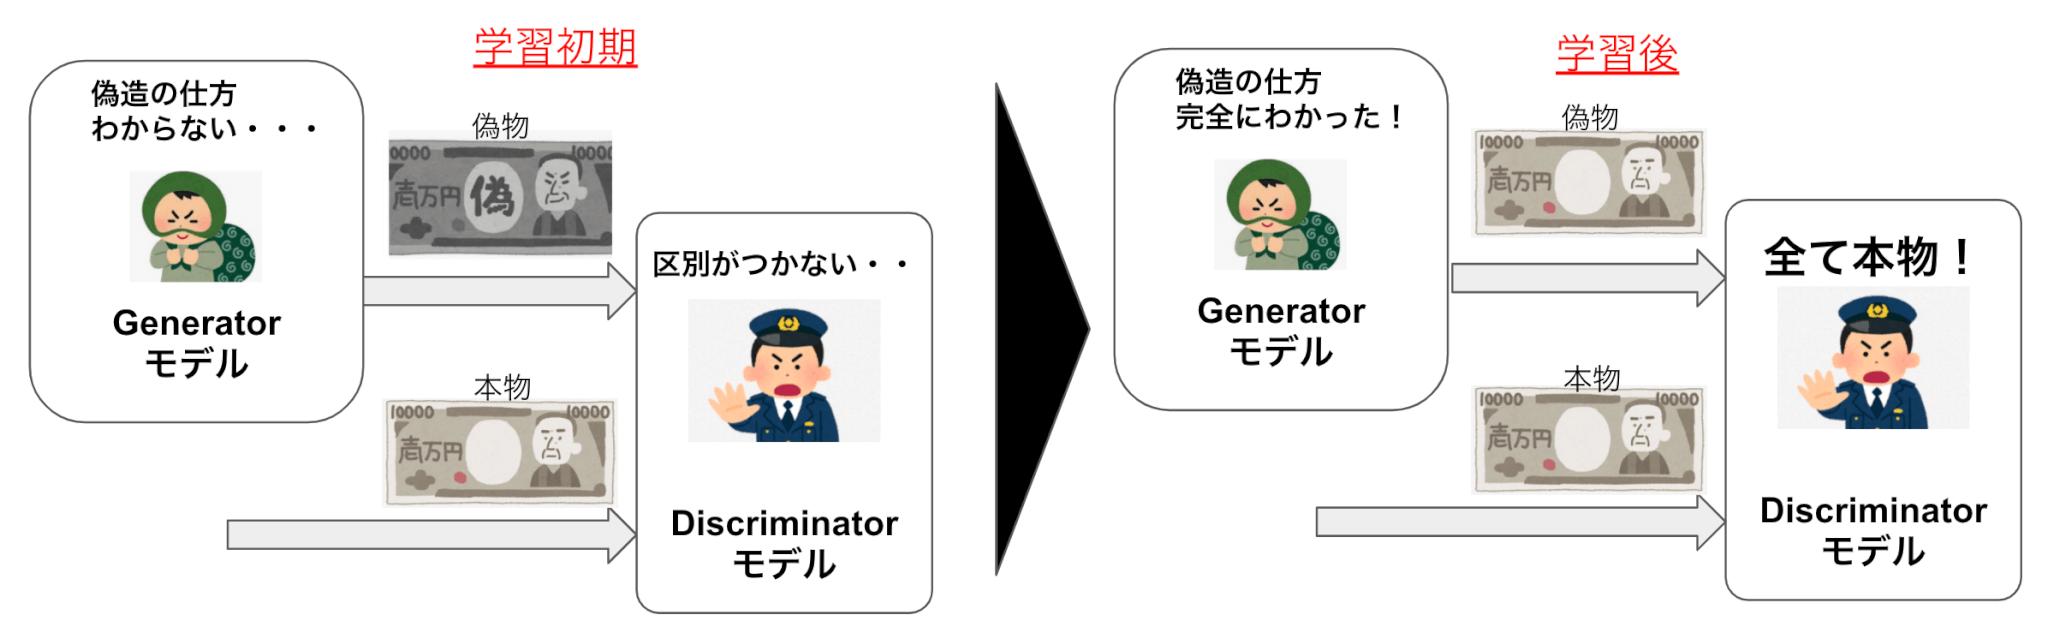 GANの分かりやすい例え GとDに関しては、よくGを『偽通貨を偽造する偽造犯』とDを『偽通貨と本物の通貨を見分ける警察』と表現される